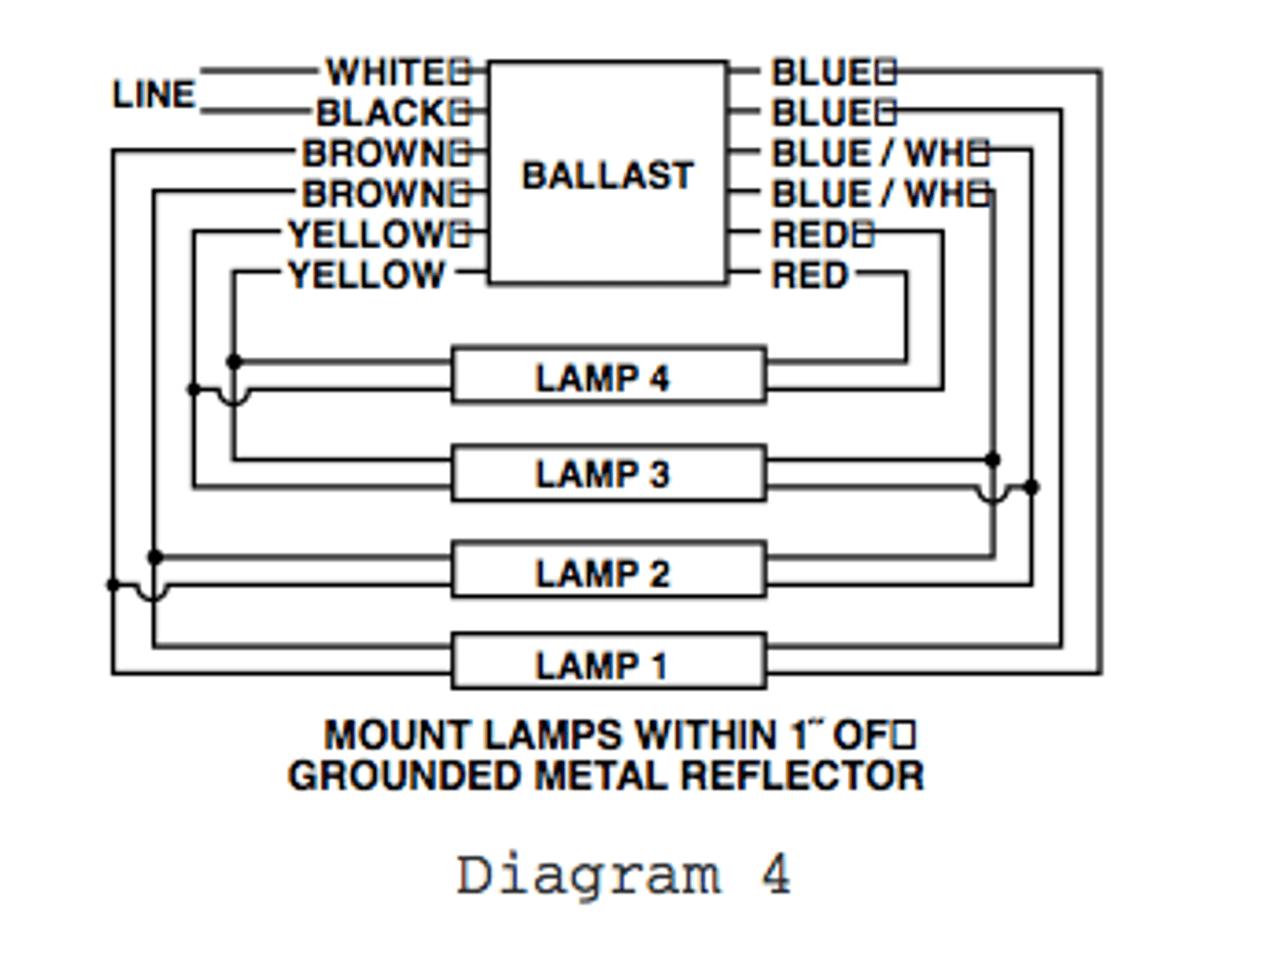 4 wire diagram ballast [ 1280 x 966 Pixel ]